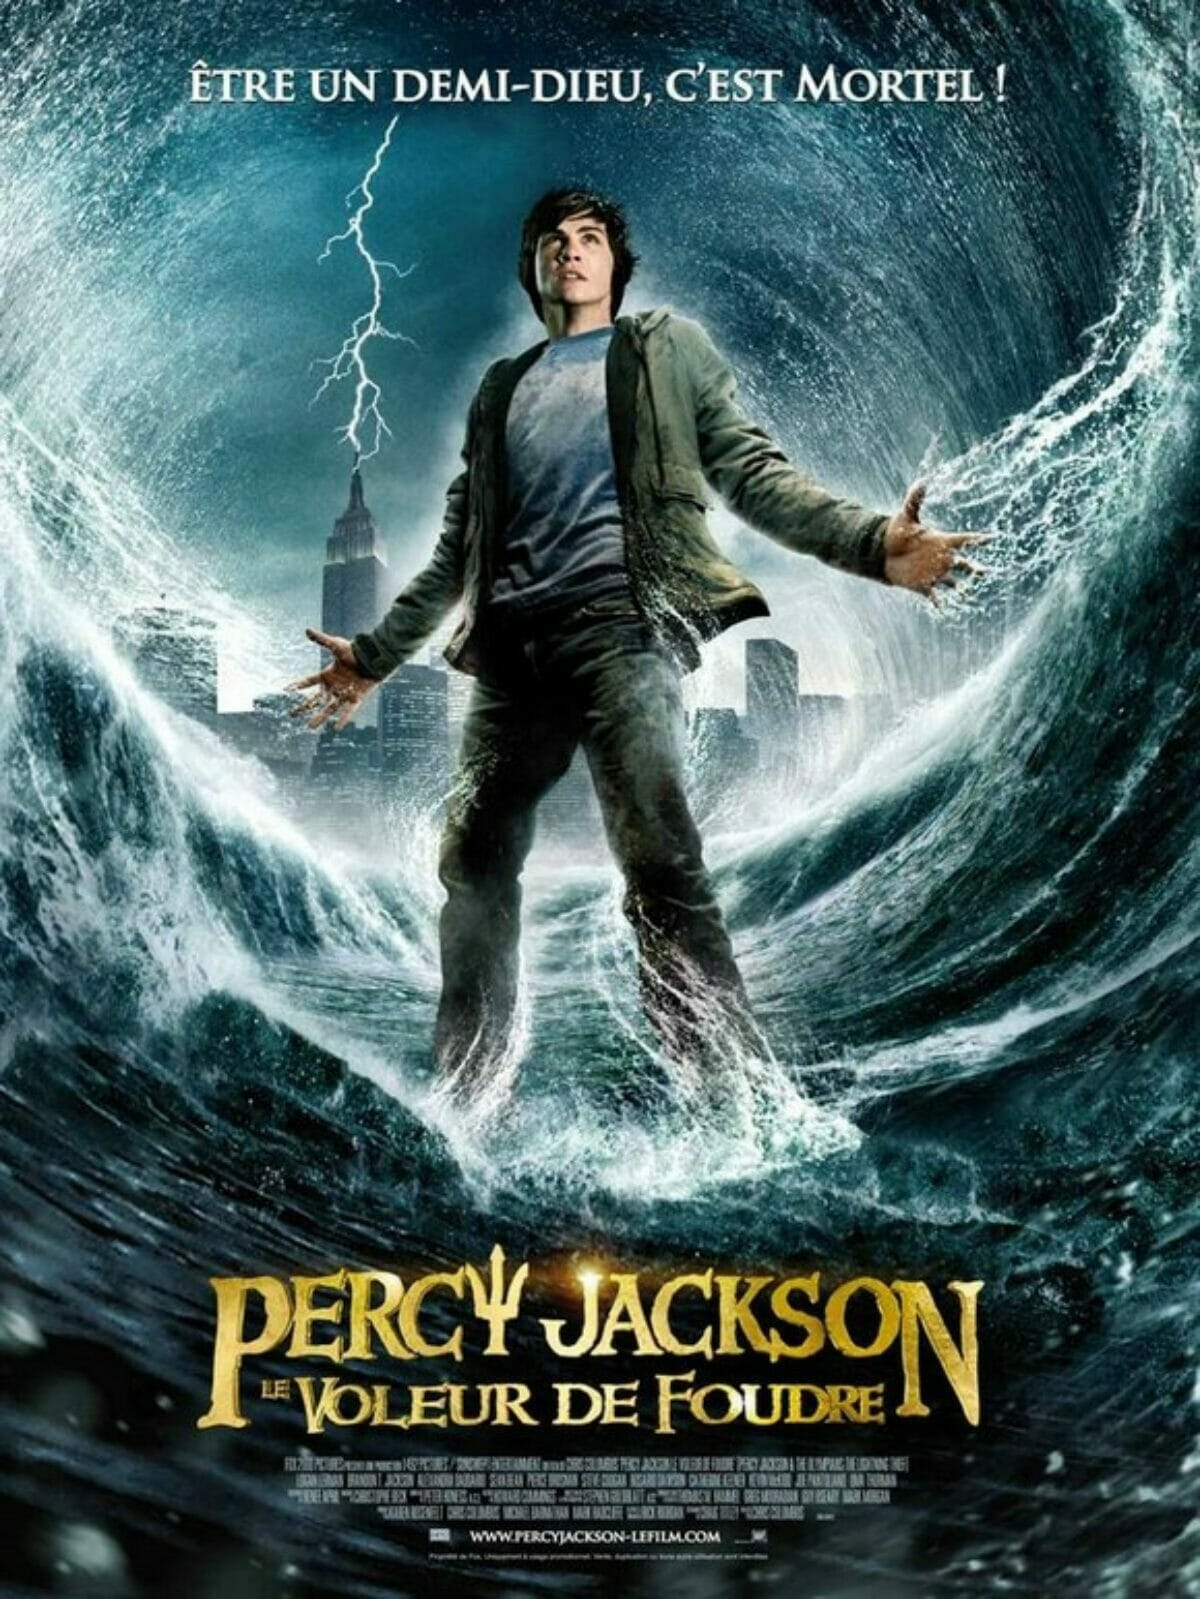 Percy-jackson-affiche